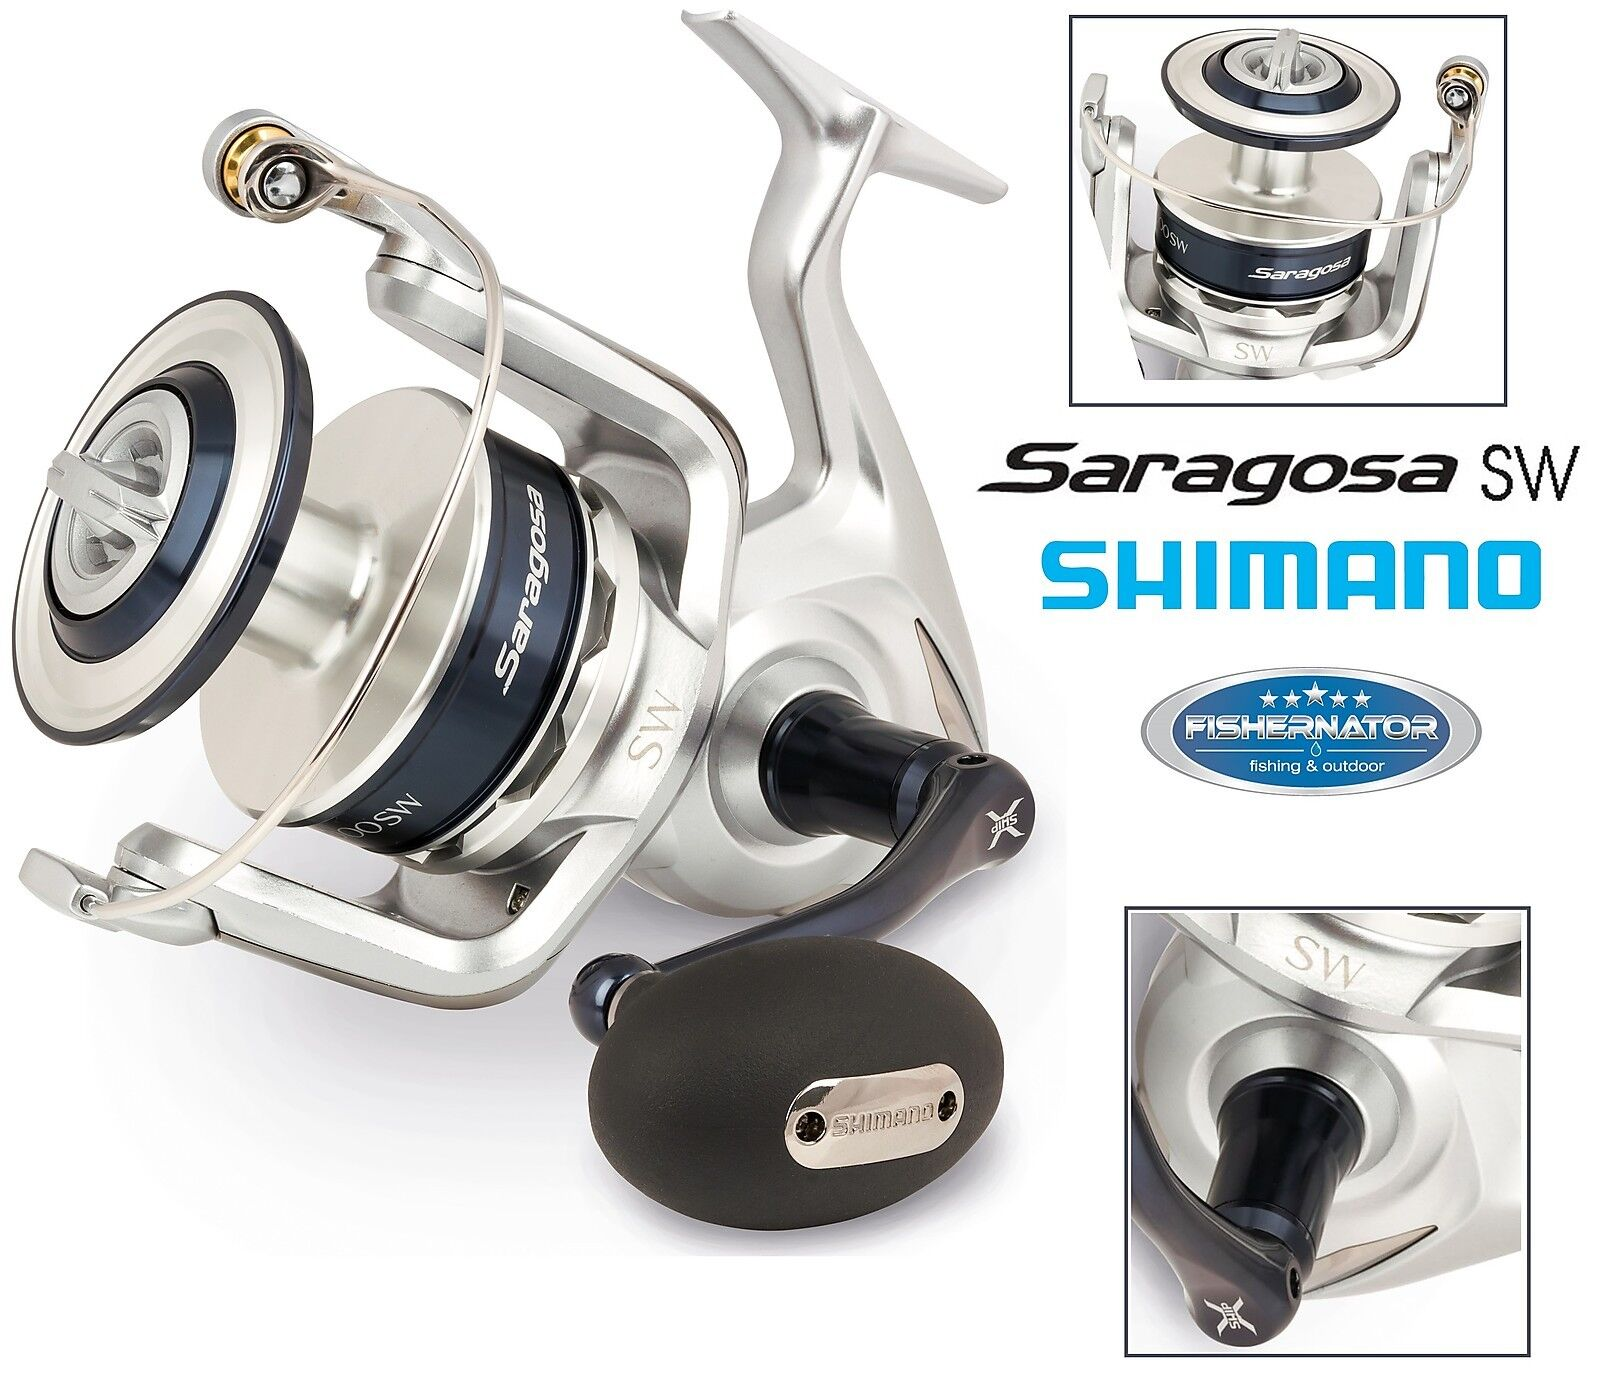 Shimano Saragosa Saragosa Shimano 10000 SW Salzwasser Angelrolle, SRG10000SW 375faf